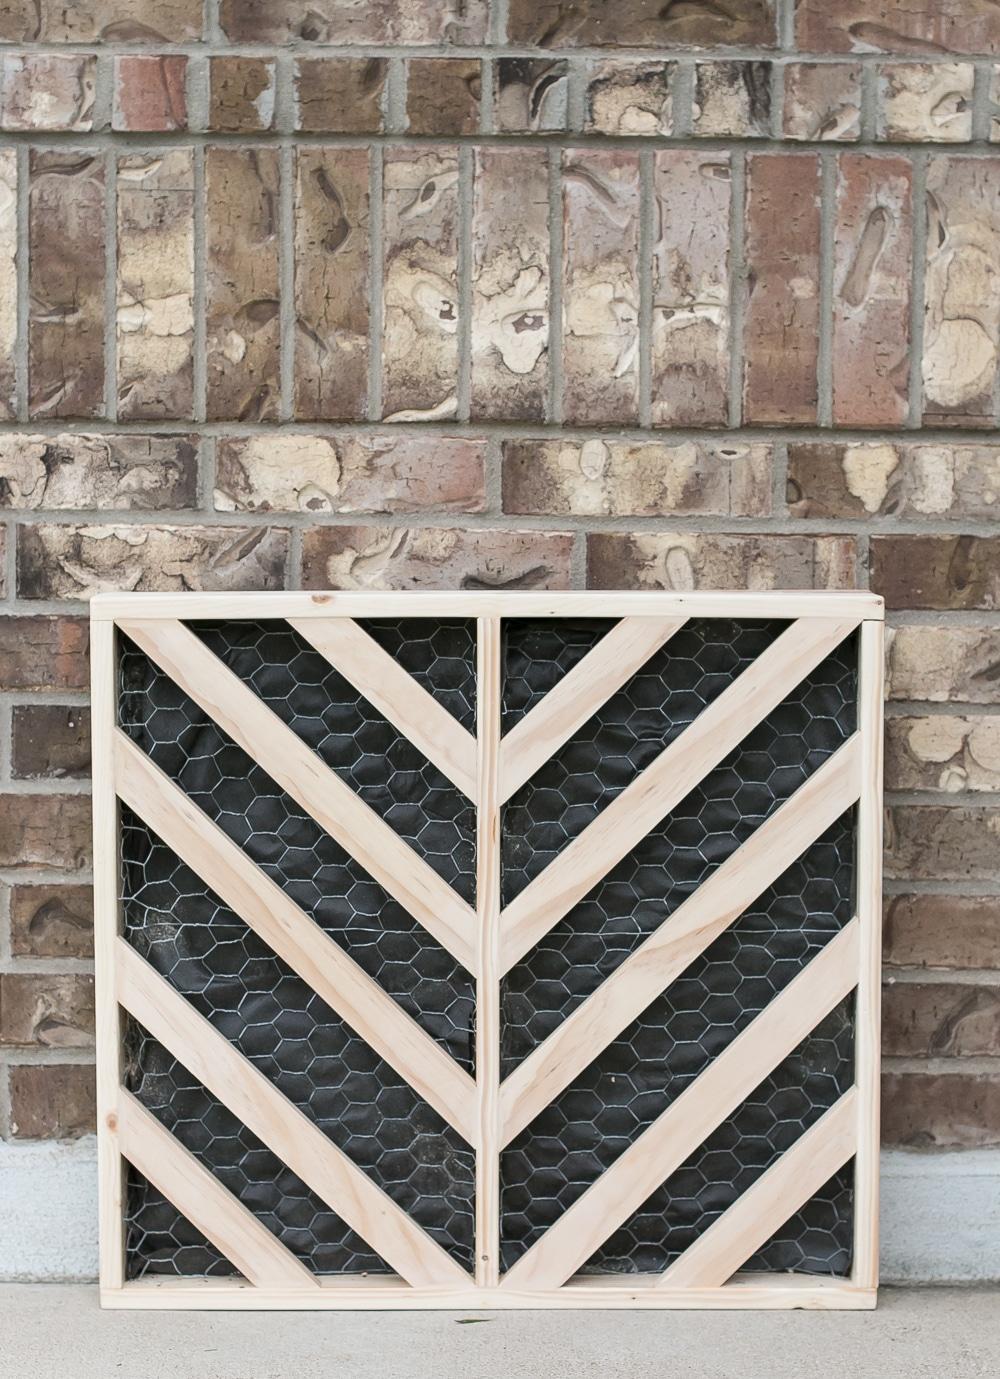 How to build a DIY chevron wall planter